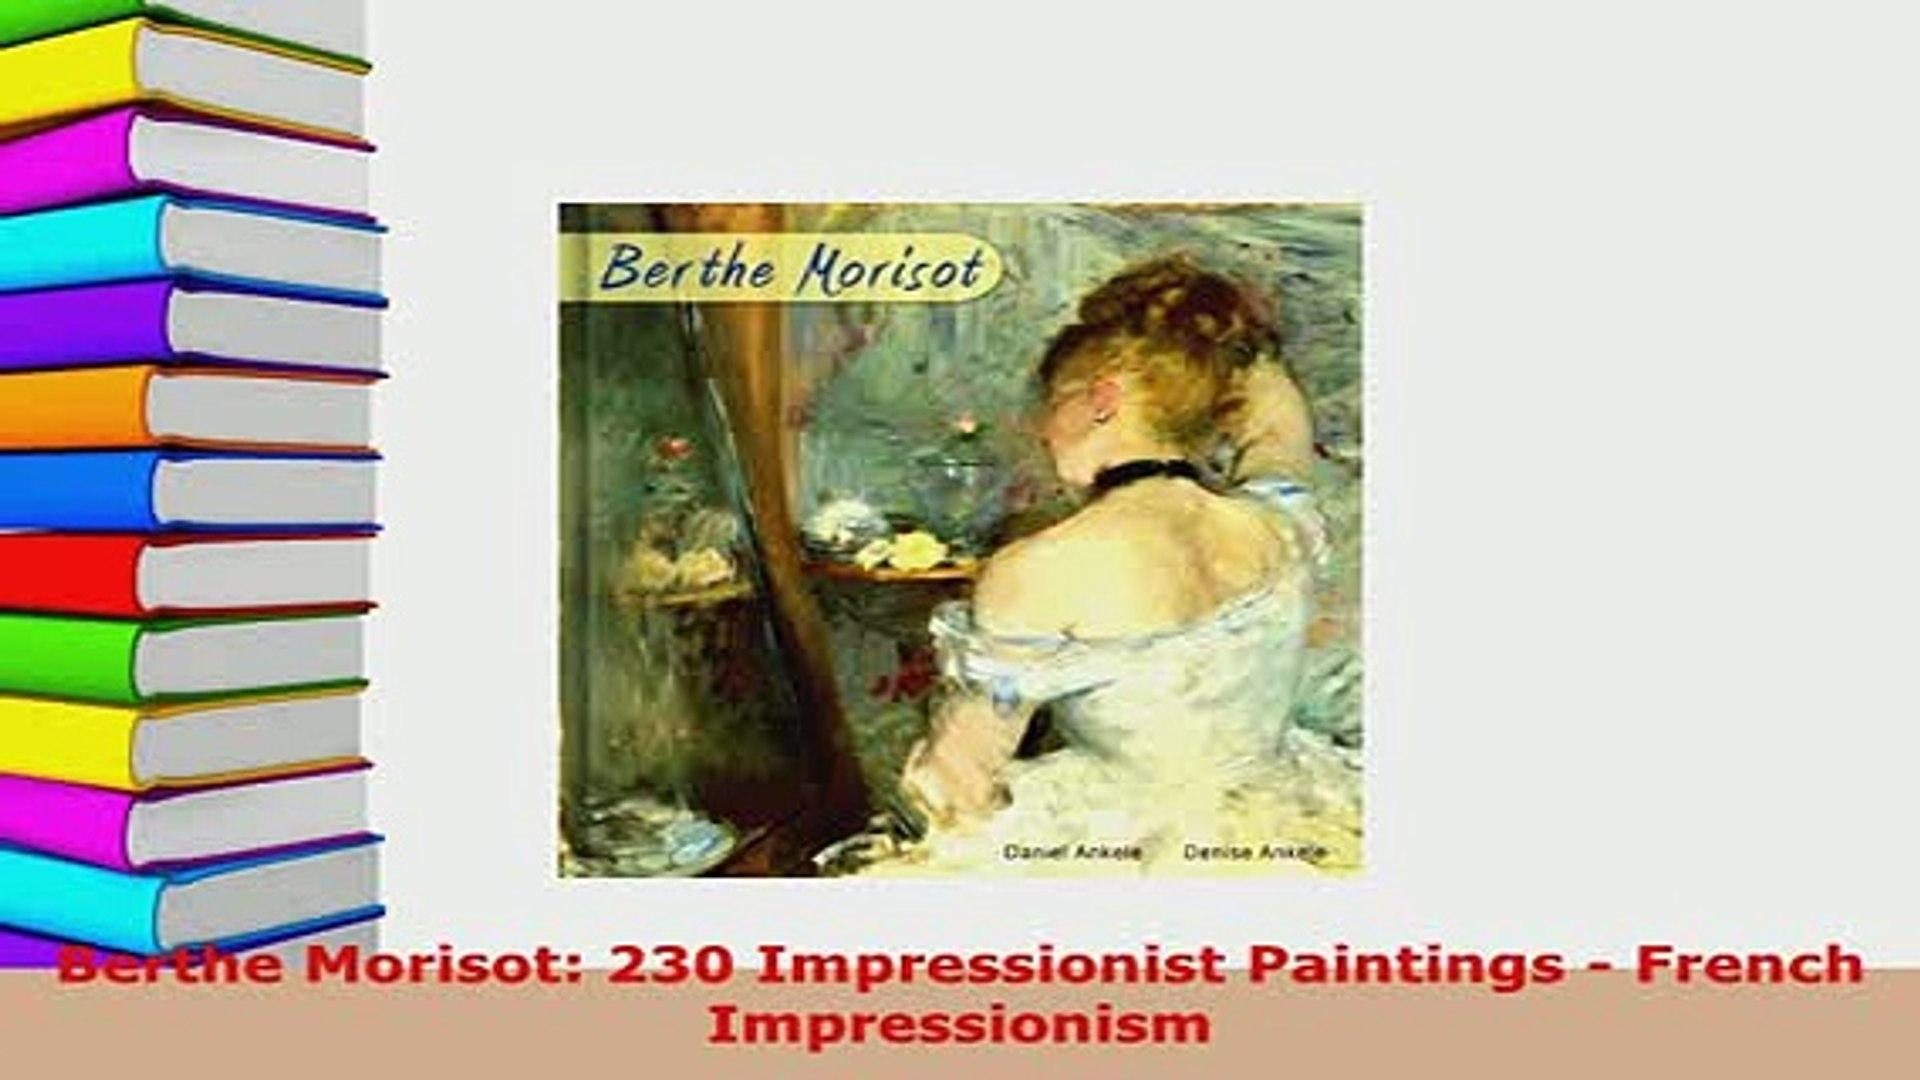 William Merritt Chase: American Impressionist - 600+ Masterpiece Paintings - Impressionism